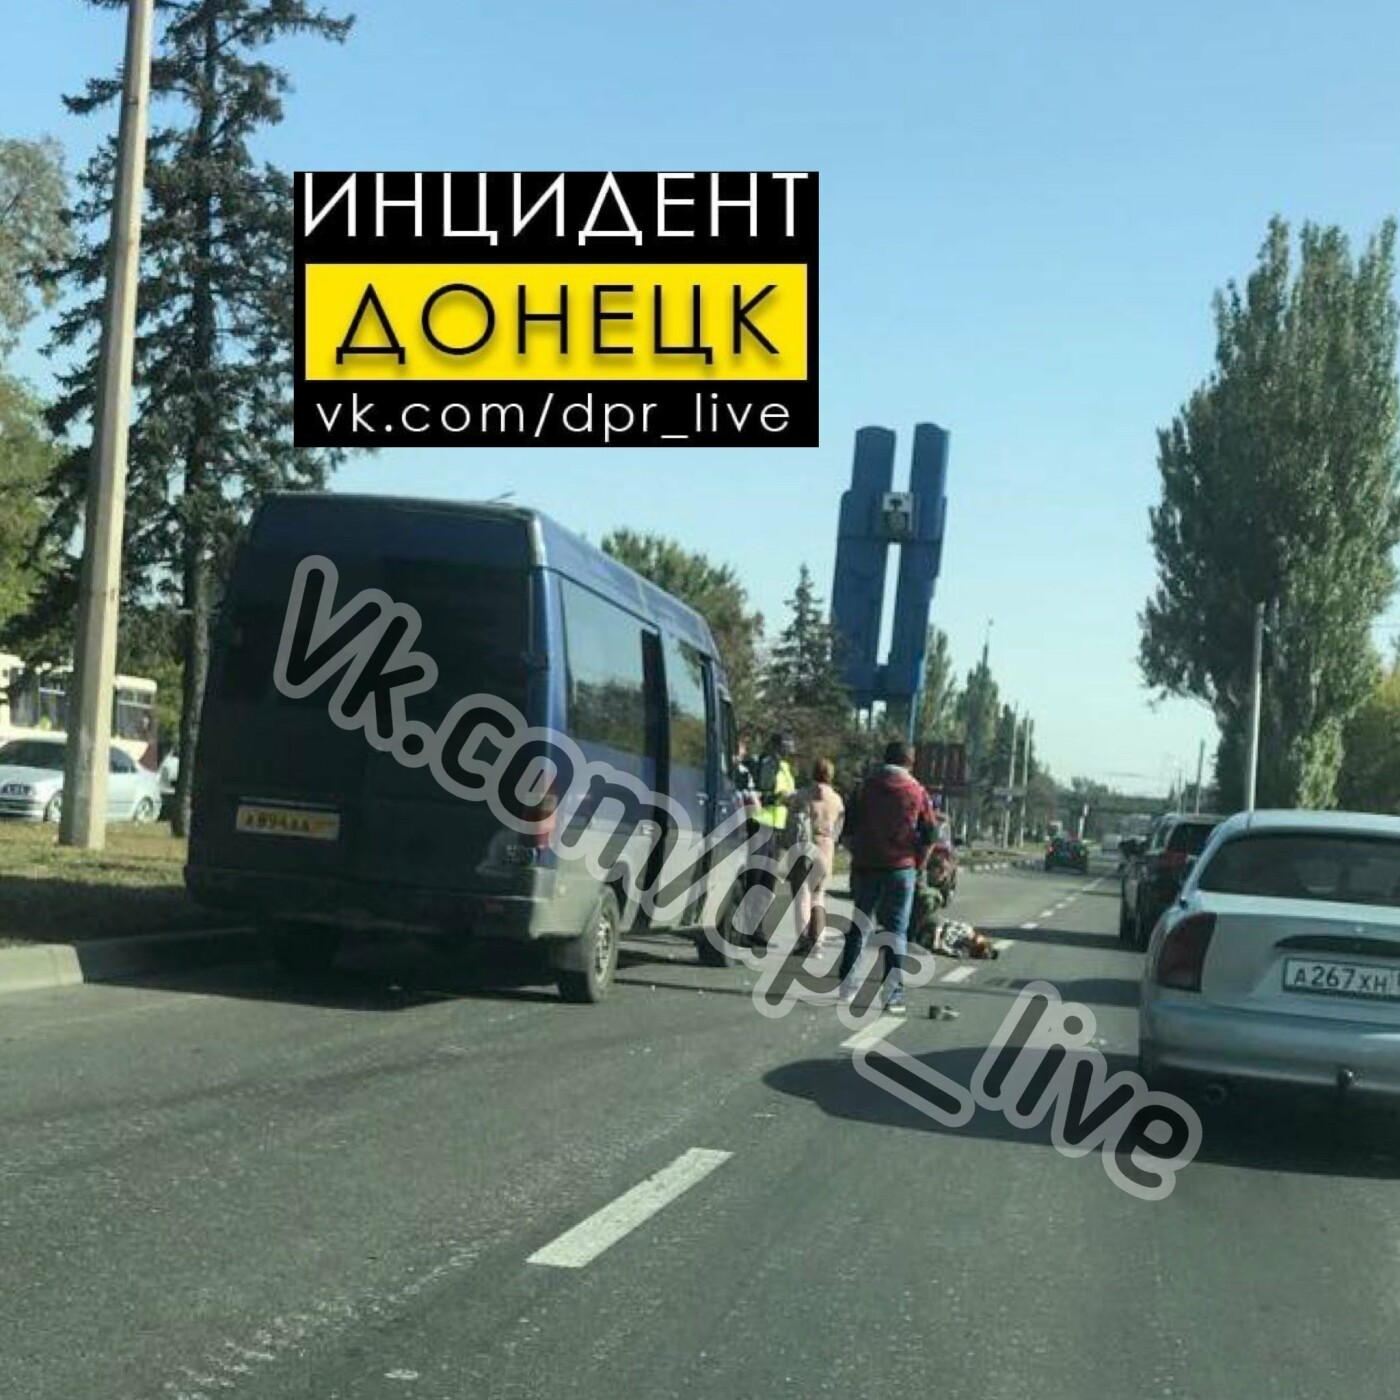 В Донецке маршрутка сбила женщину, - ФОТО, фото-1